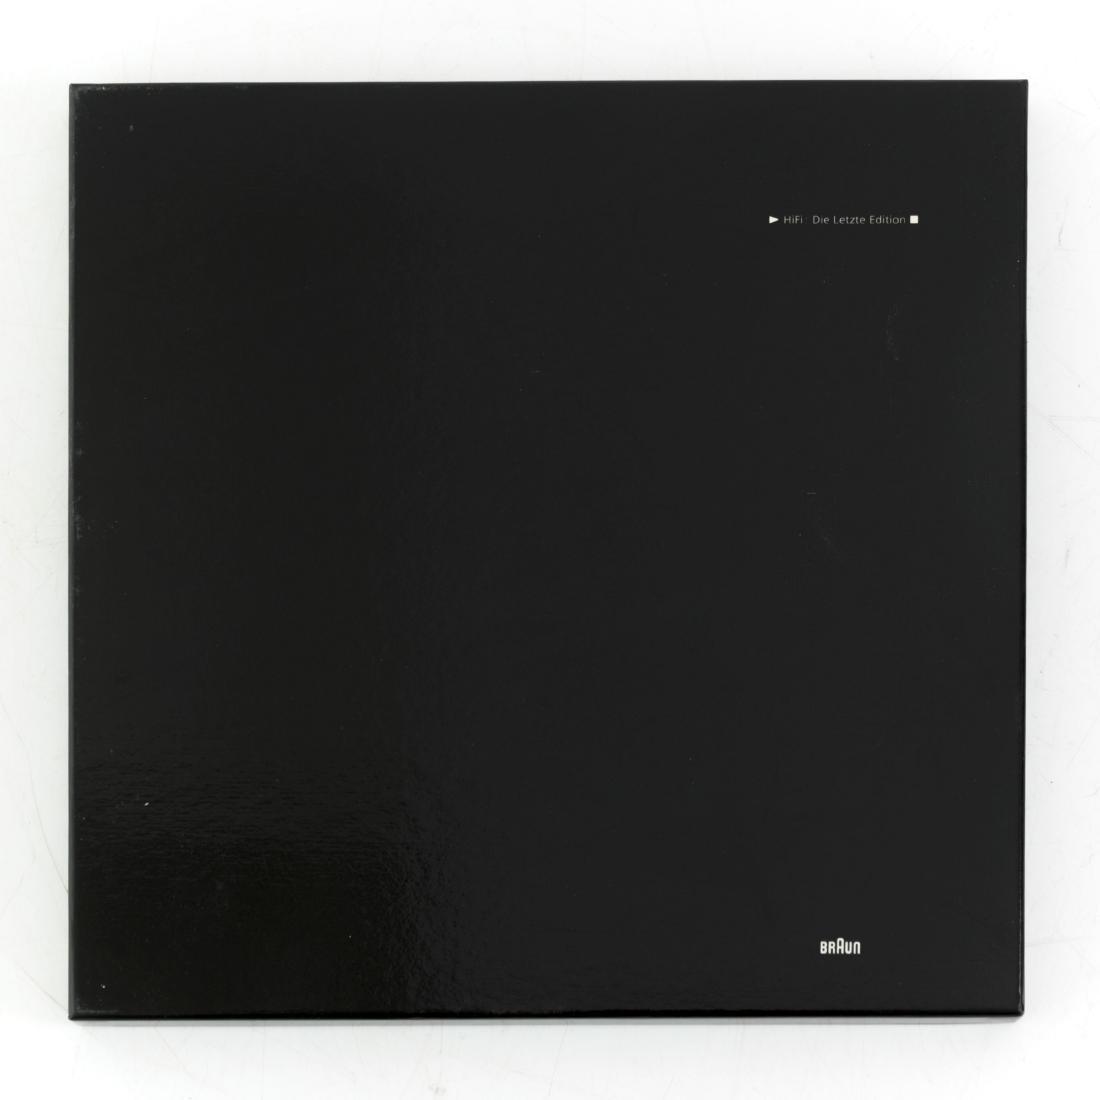 'Atelier Last Edition' book, 1991 - 2